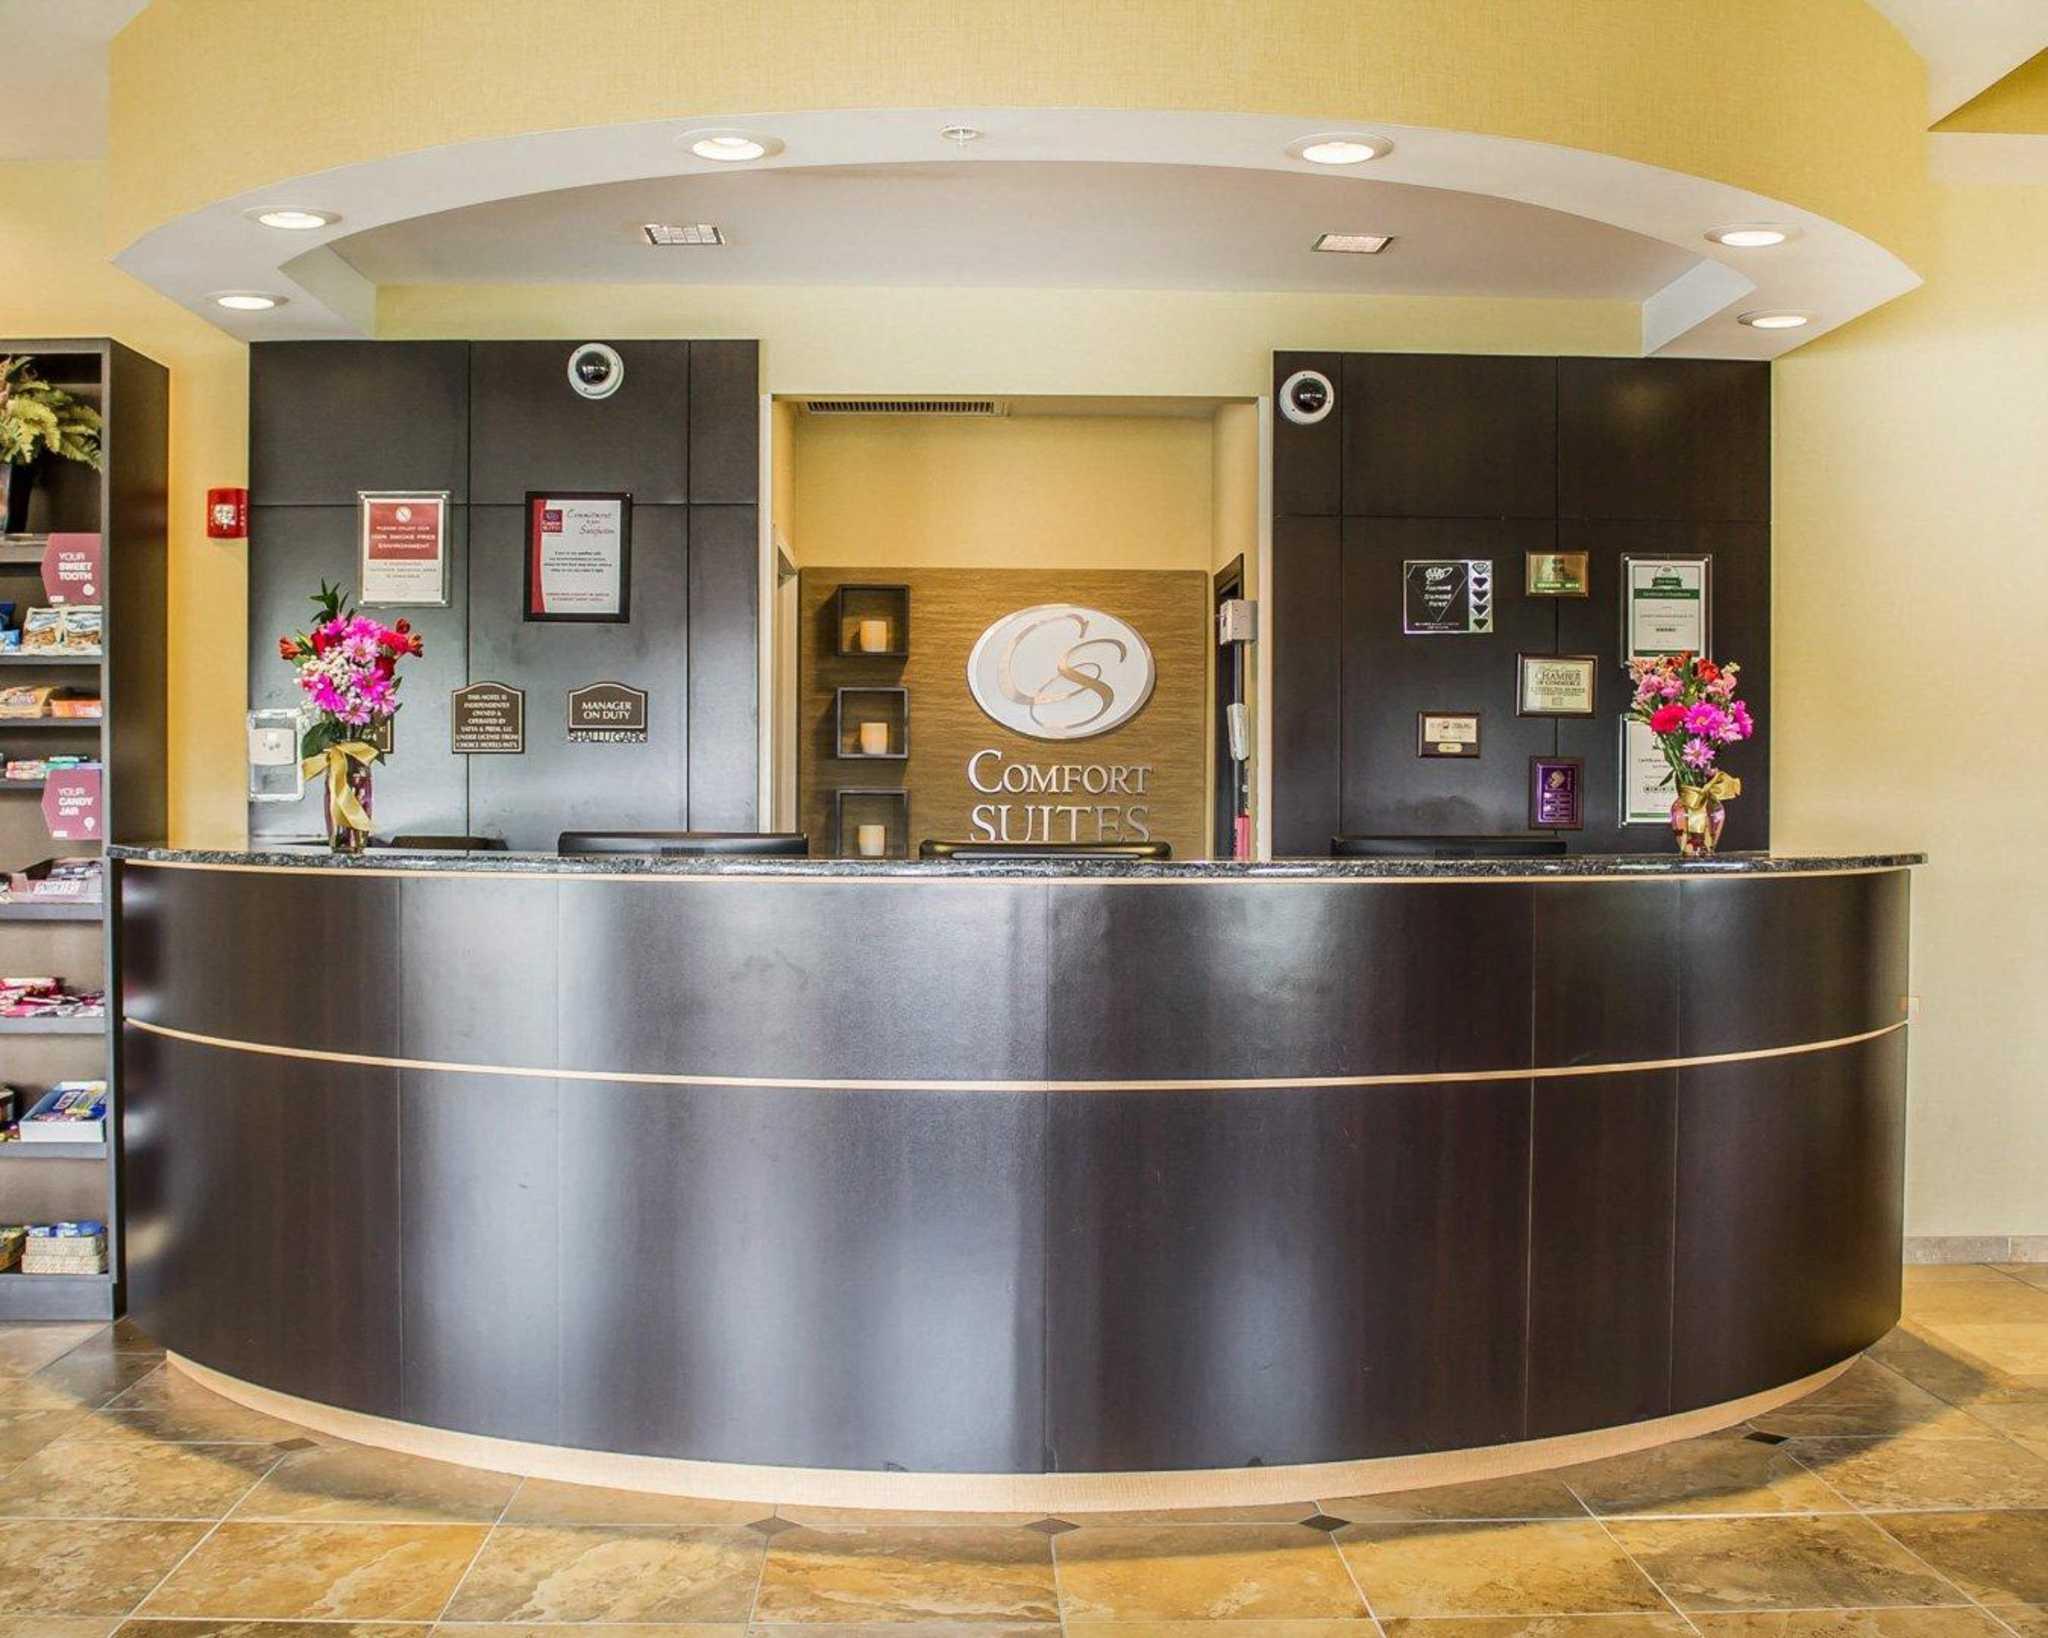 Comfort Suites East Broad at 270 image 38